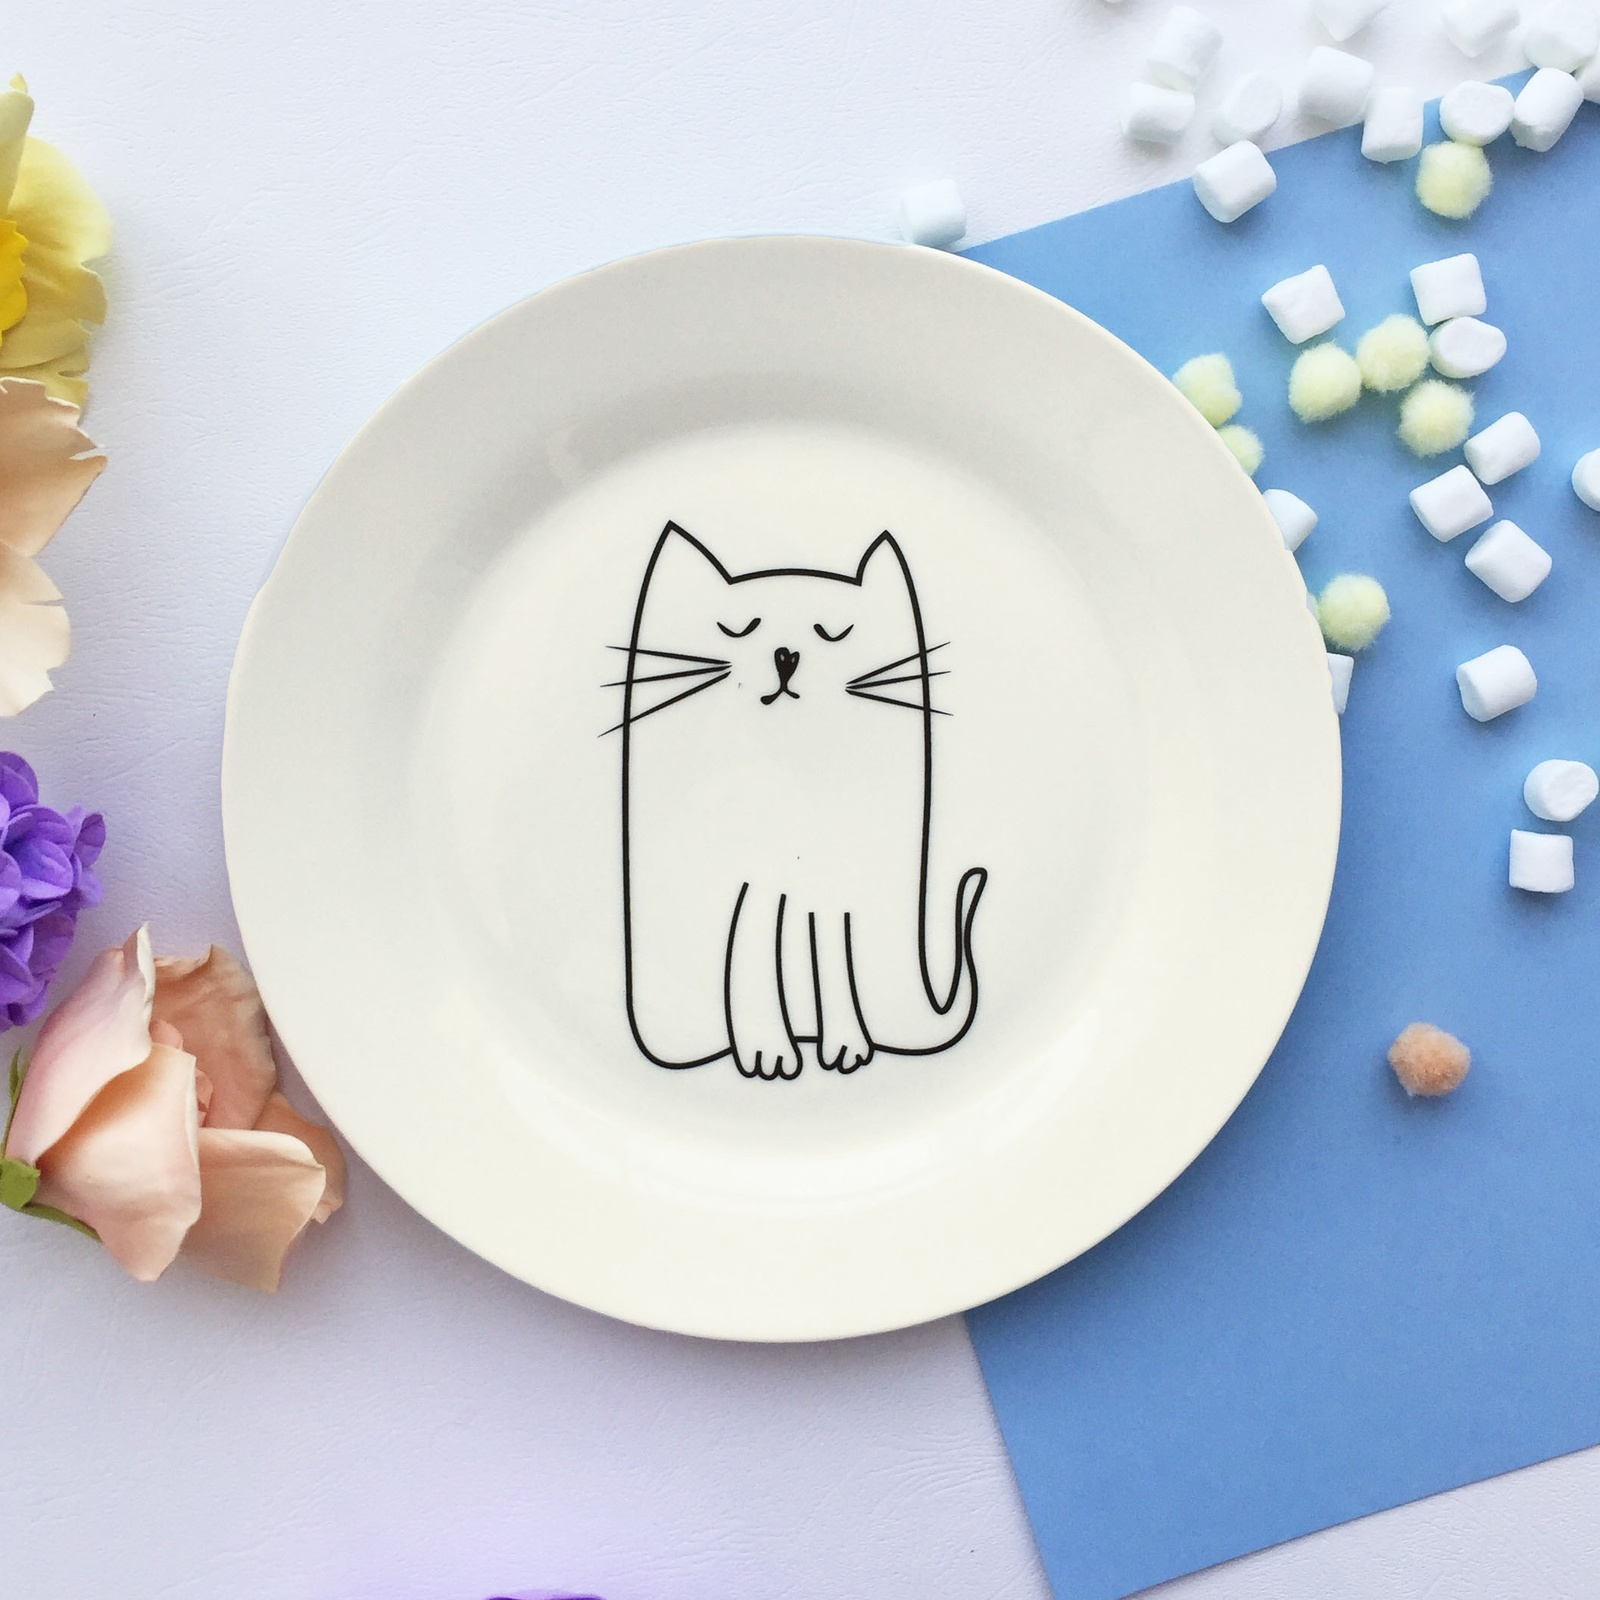 Тарелка Сотвори Чудо Киска 20 см, белый тарелка мелкая сотвори чудо бантик sans brides диаметр 20 см